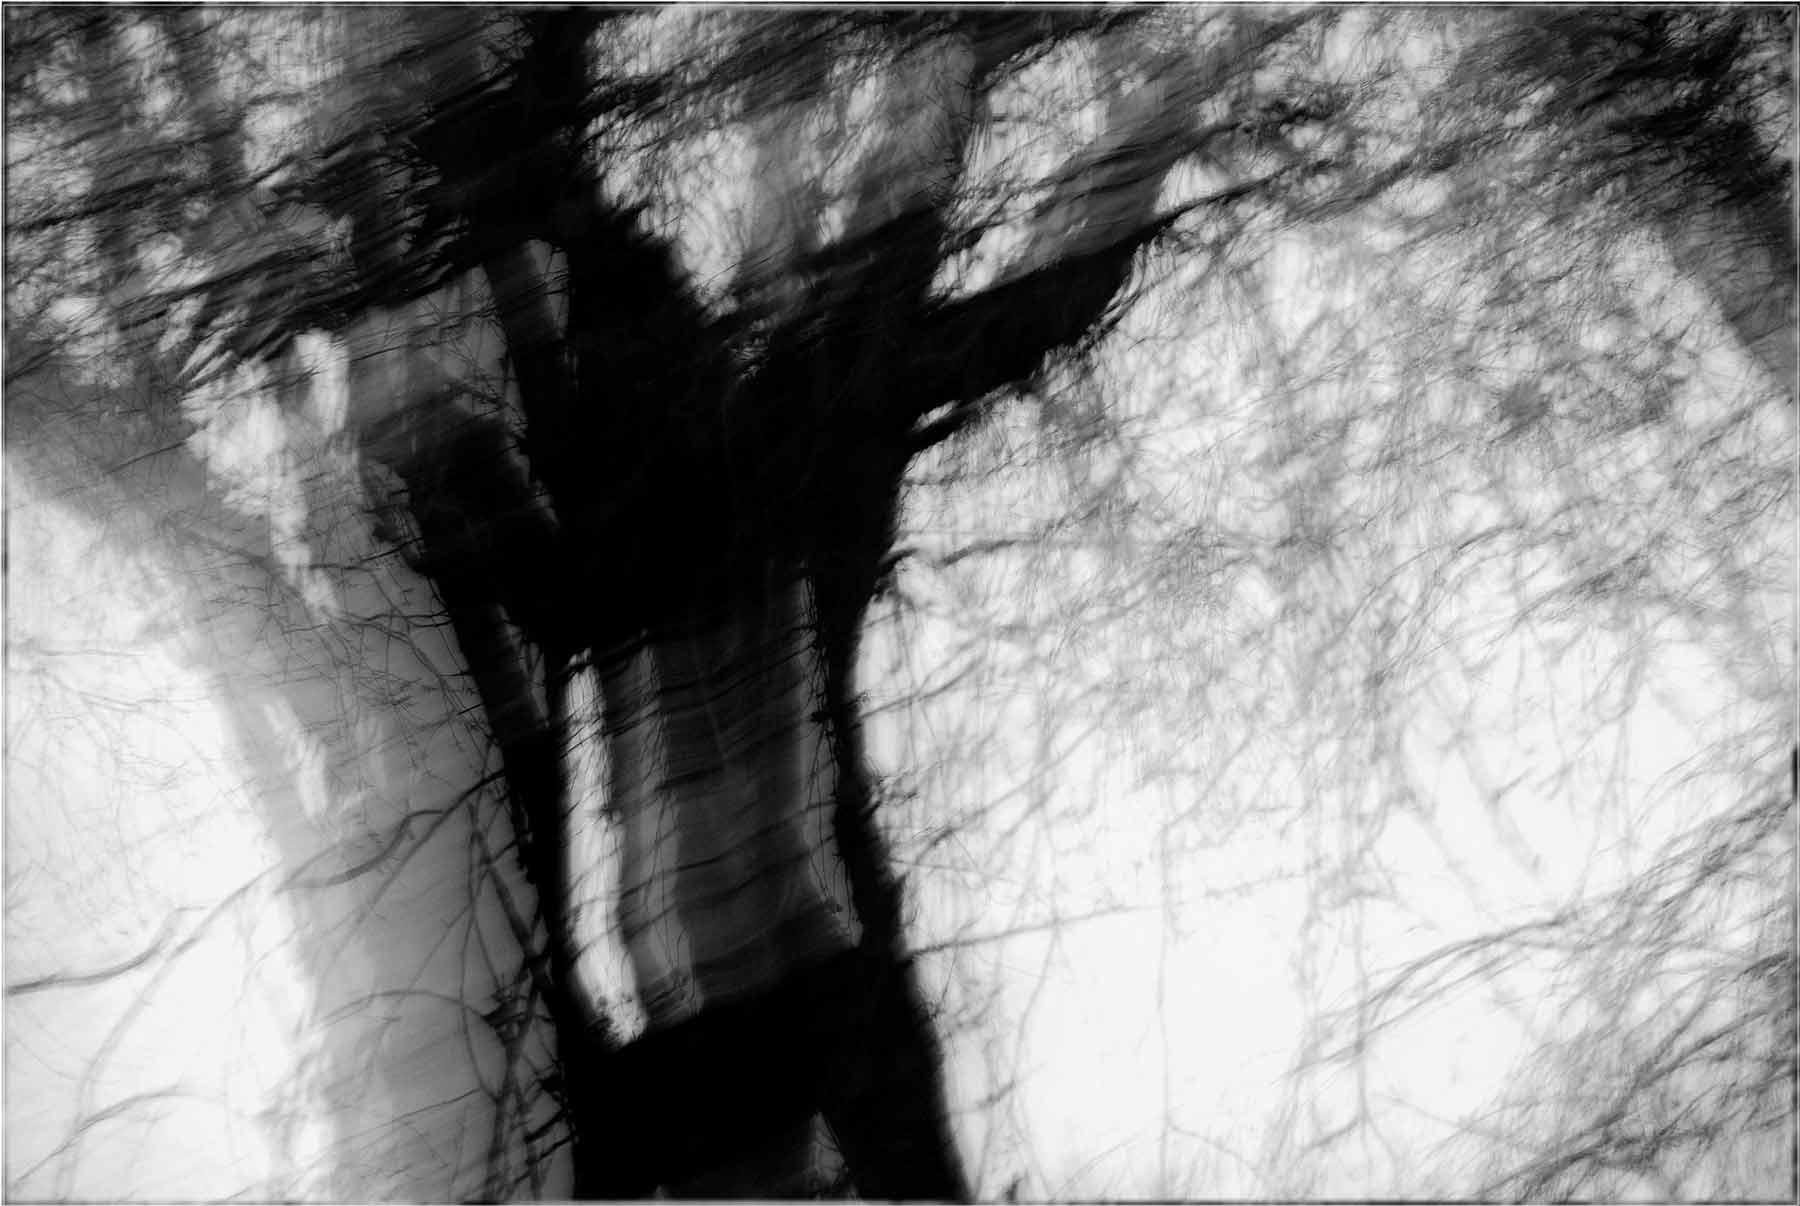 © Gilles Bourgeade